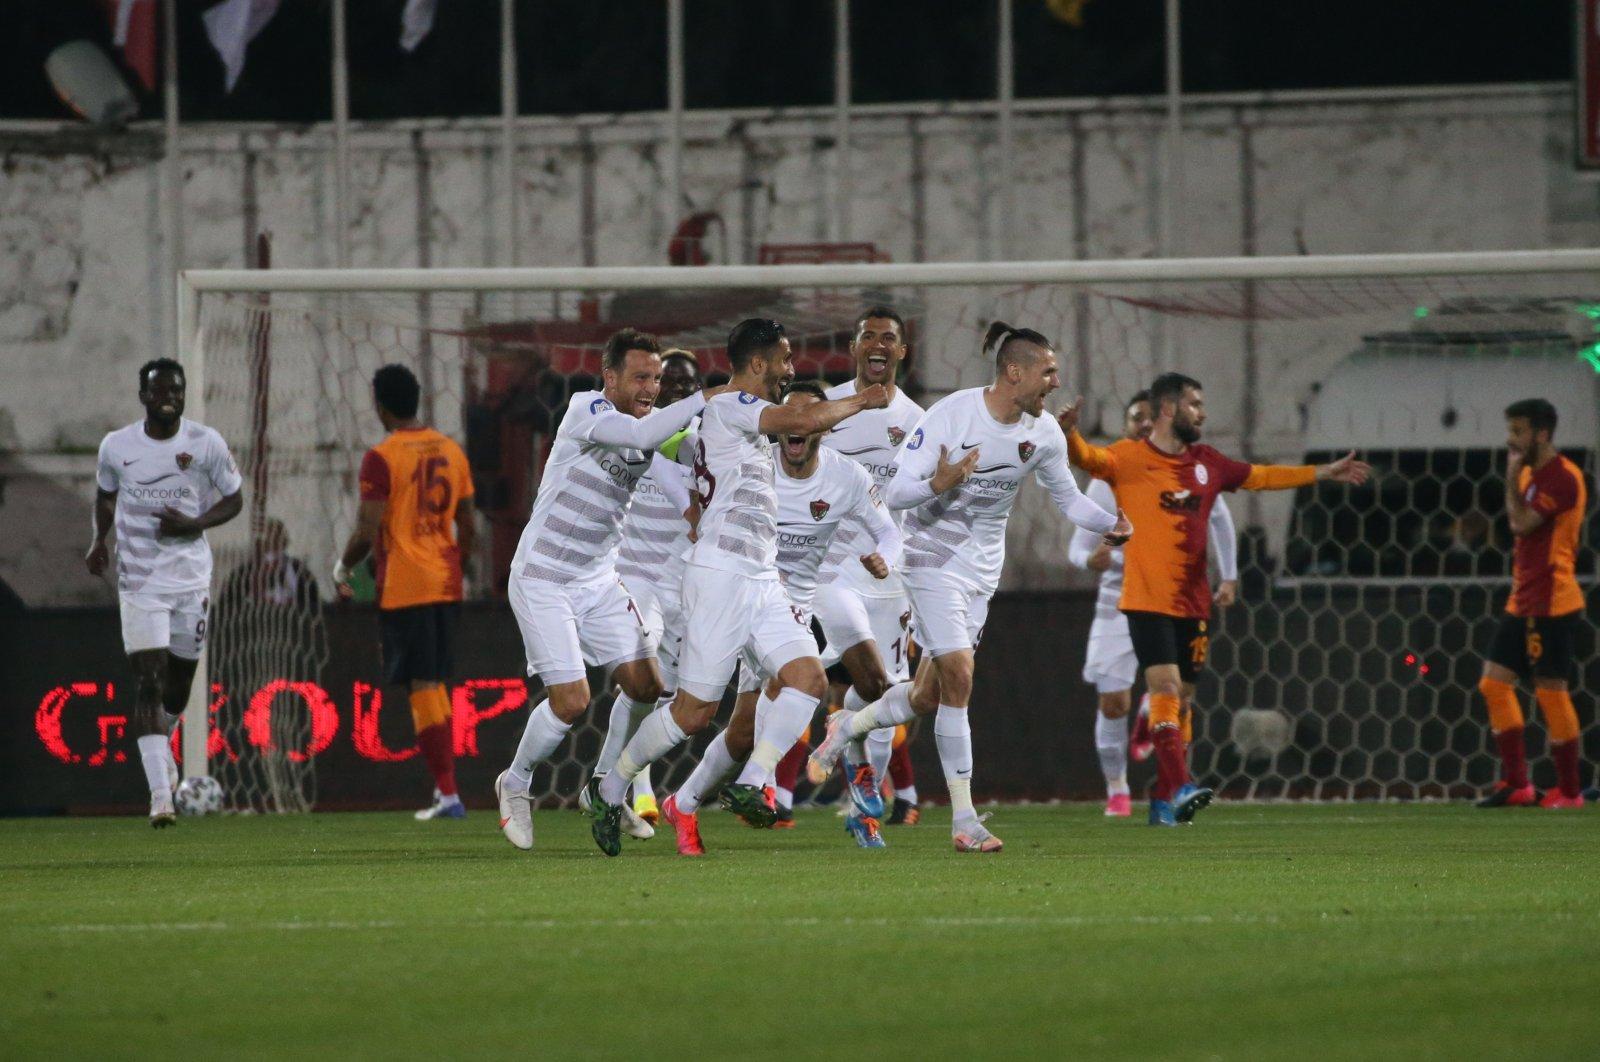 Atakaş Hatayspor players celebrate after a goal in Turkish Süper Lig Week 32 match against Galatasaray, in Antakya, Turkey, on April 3, 2021. (AA Photo)